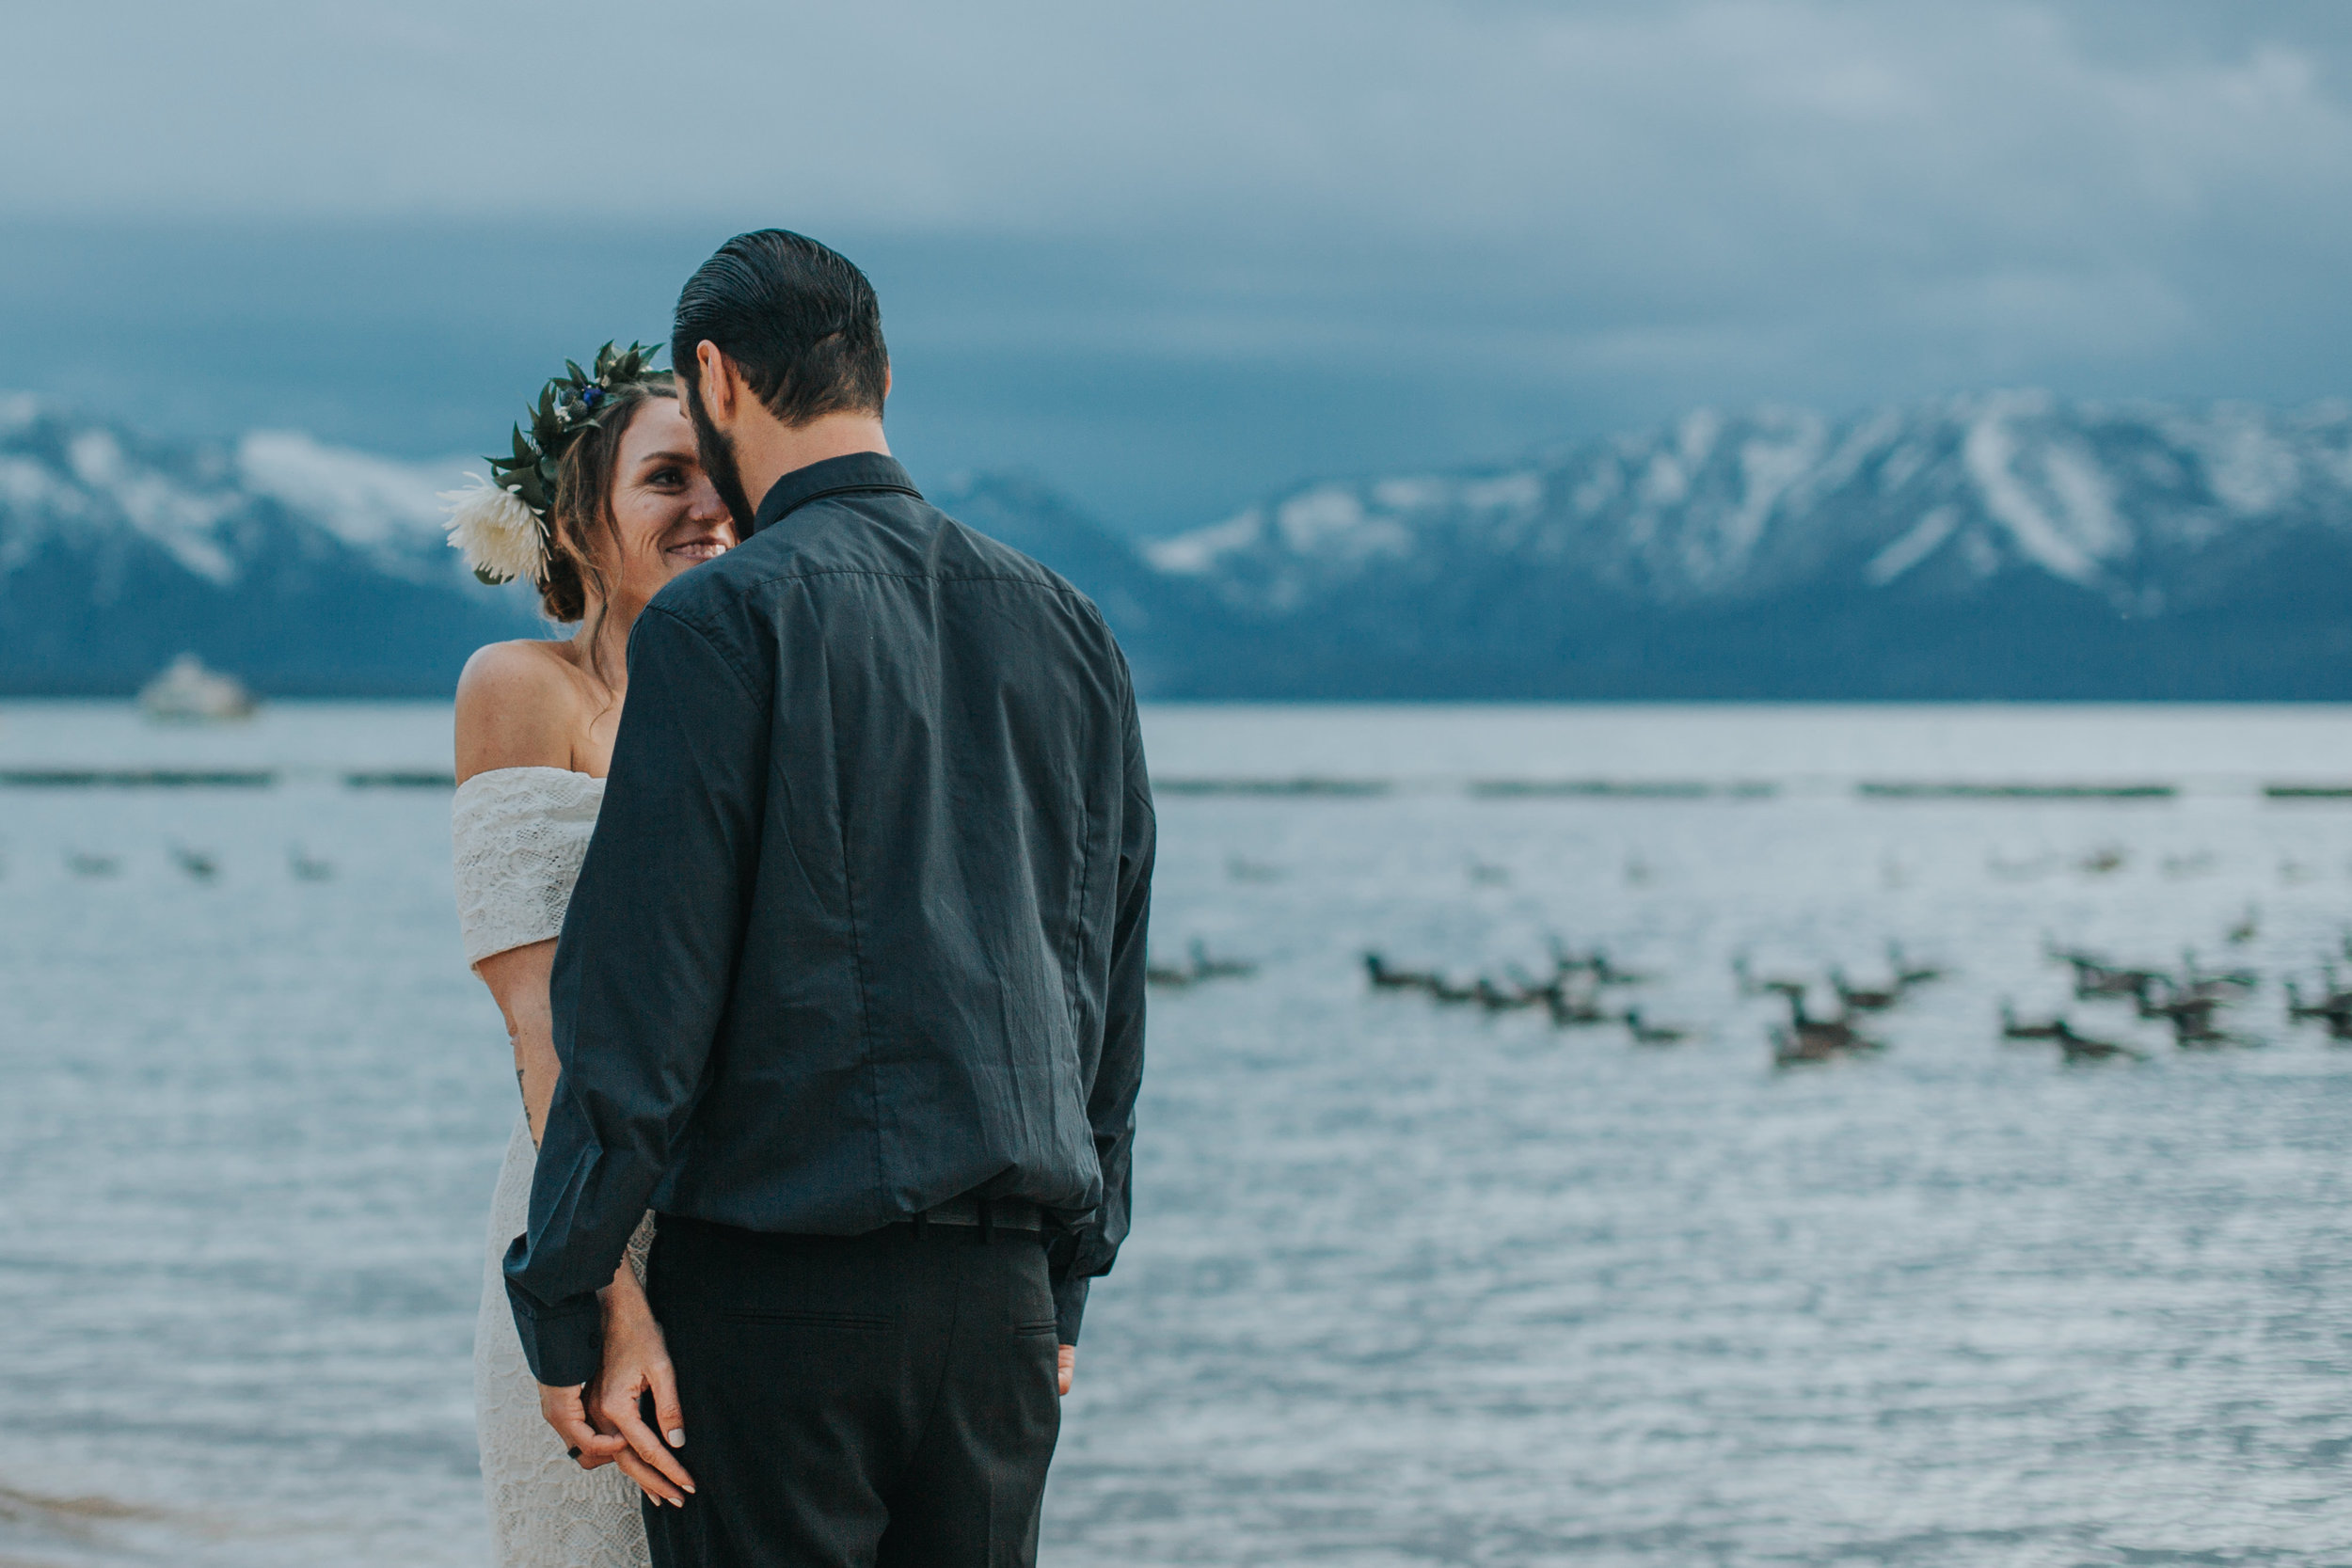 south-lake-tahoe-elopement-valerie-lendvay-photo-061.jpg